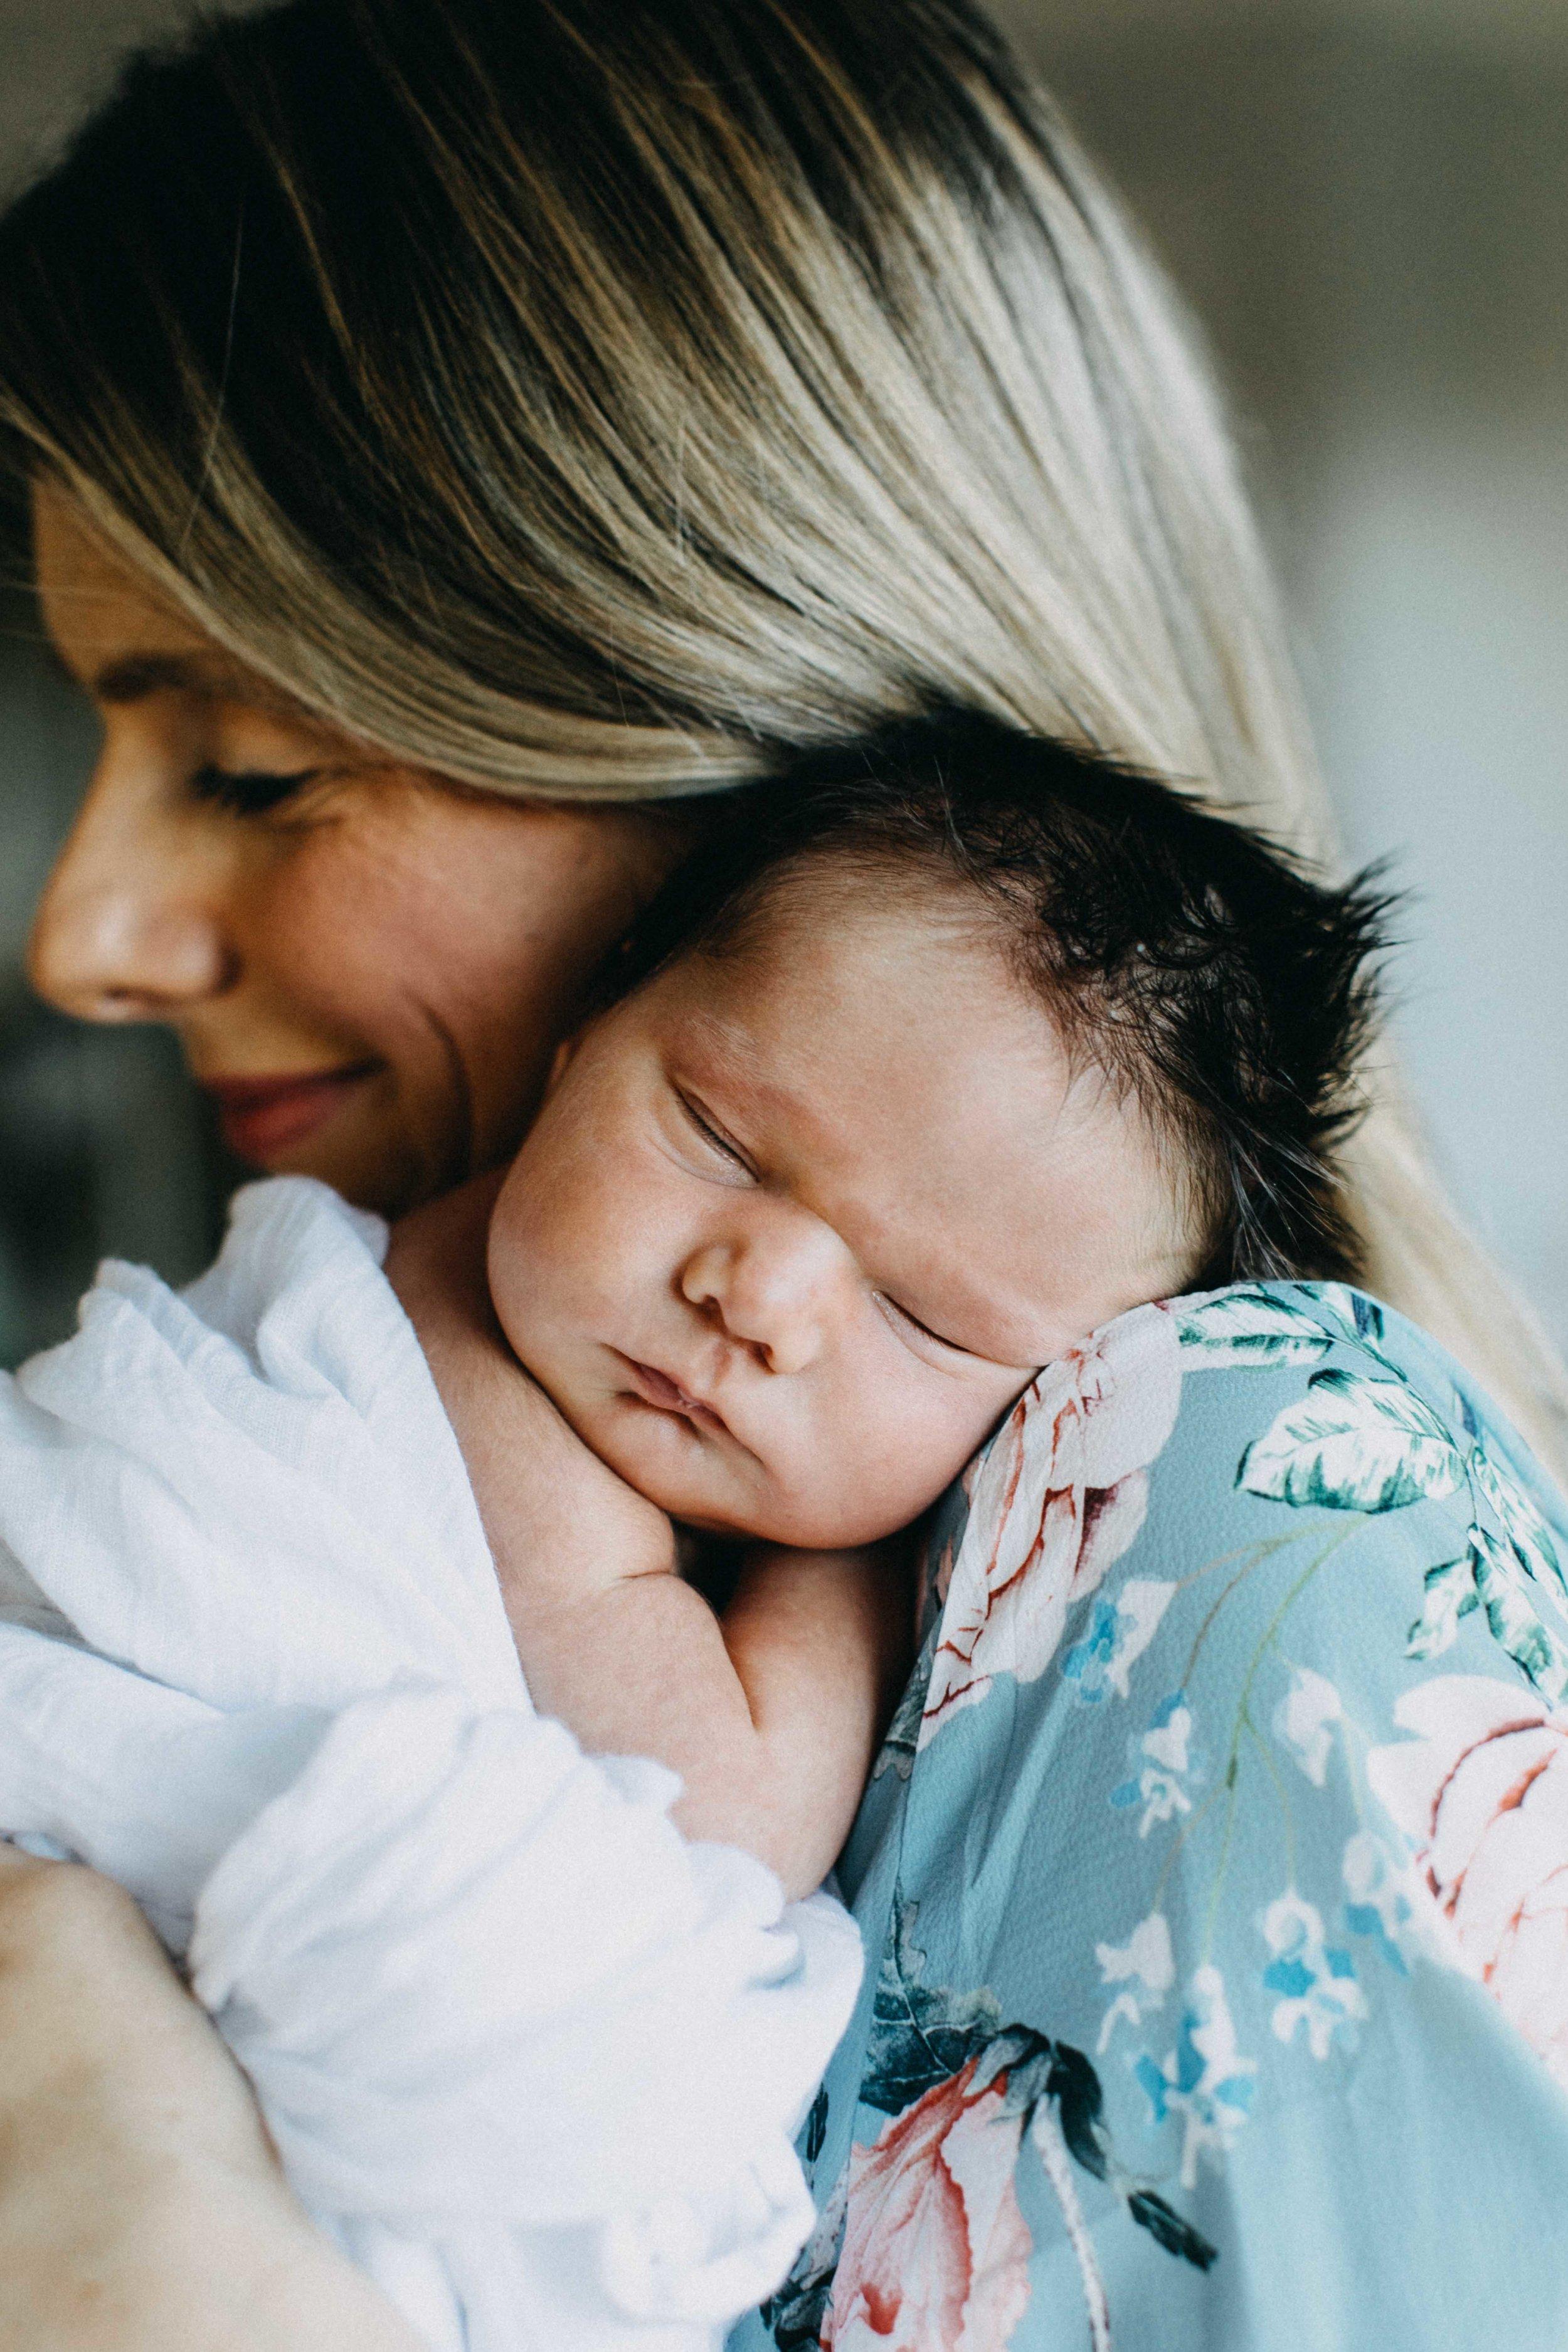 camden-newborn-photographer-laura-www.emilyobrienphotography.net-25.jpg